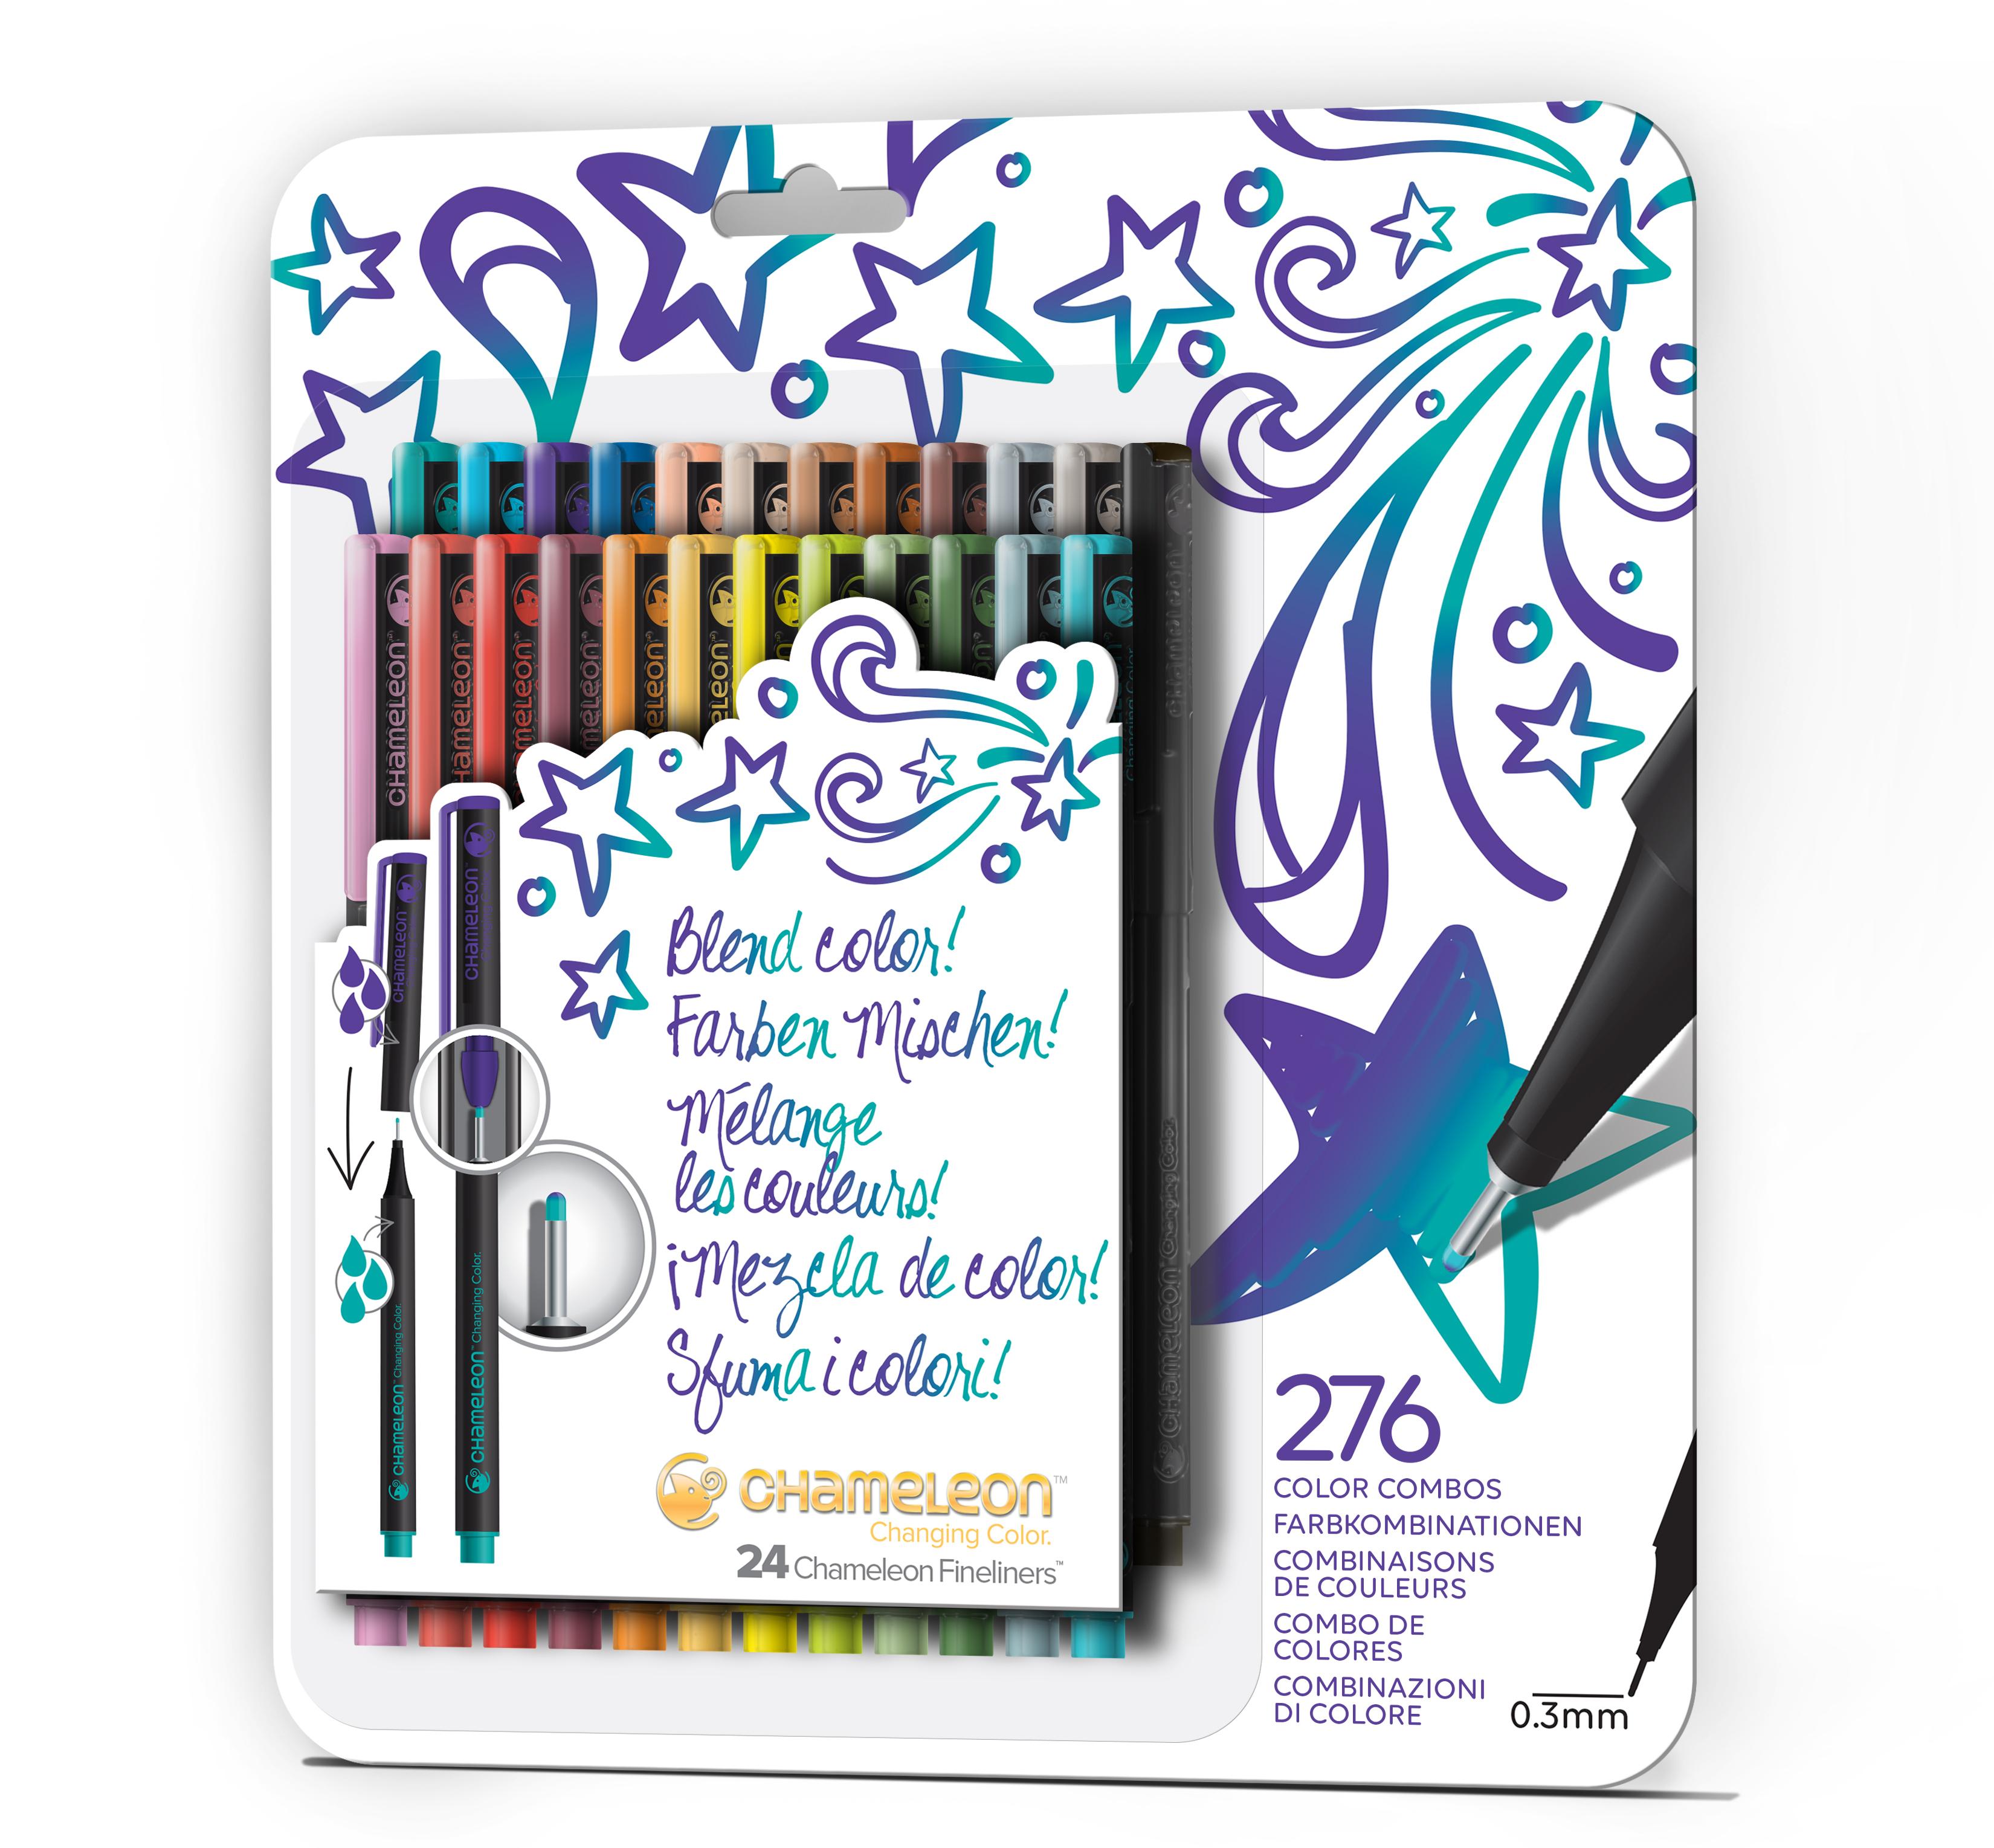 Chameleon Blendwriters 24 pack Bold Colors (カメレオンブレンドライター 24本入りボールドセット)